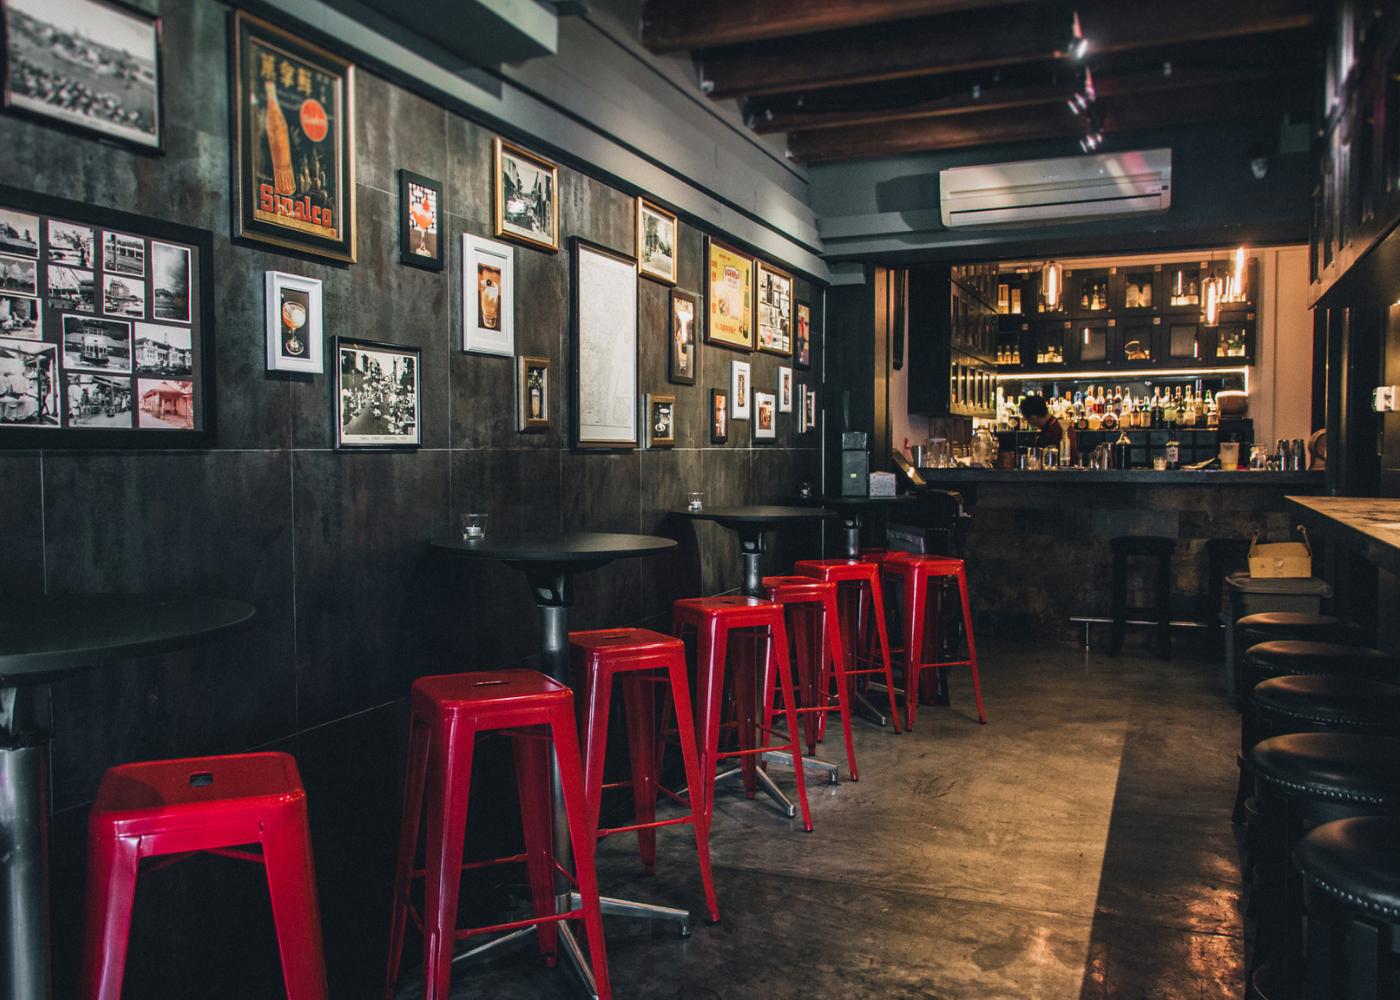 Cocktail bars in Singapore: Nutmeg & Clove